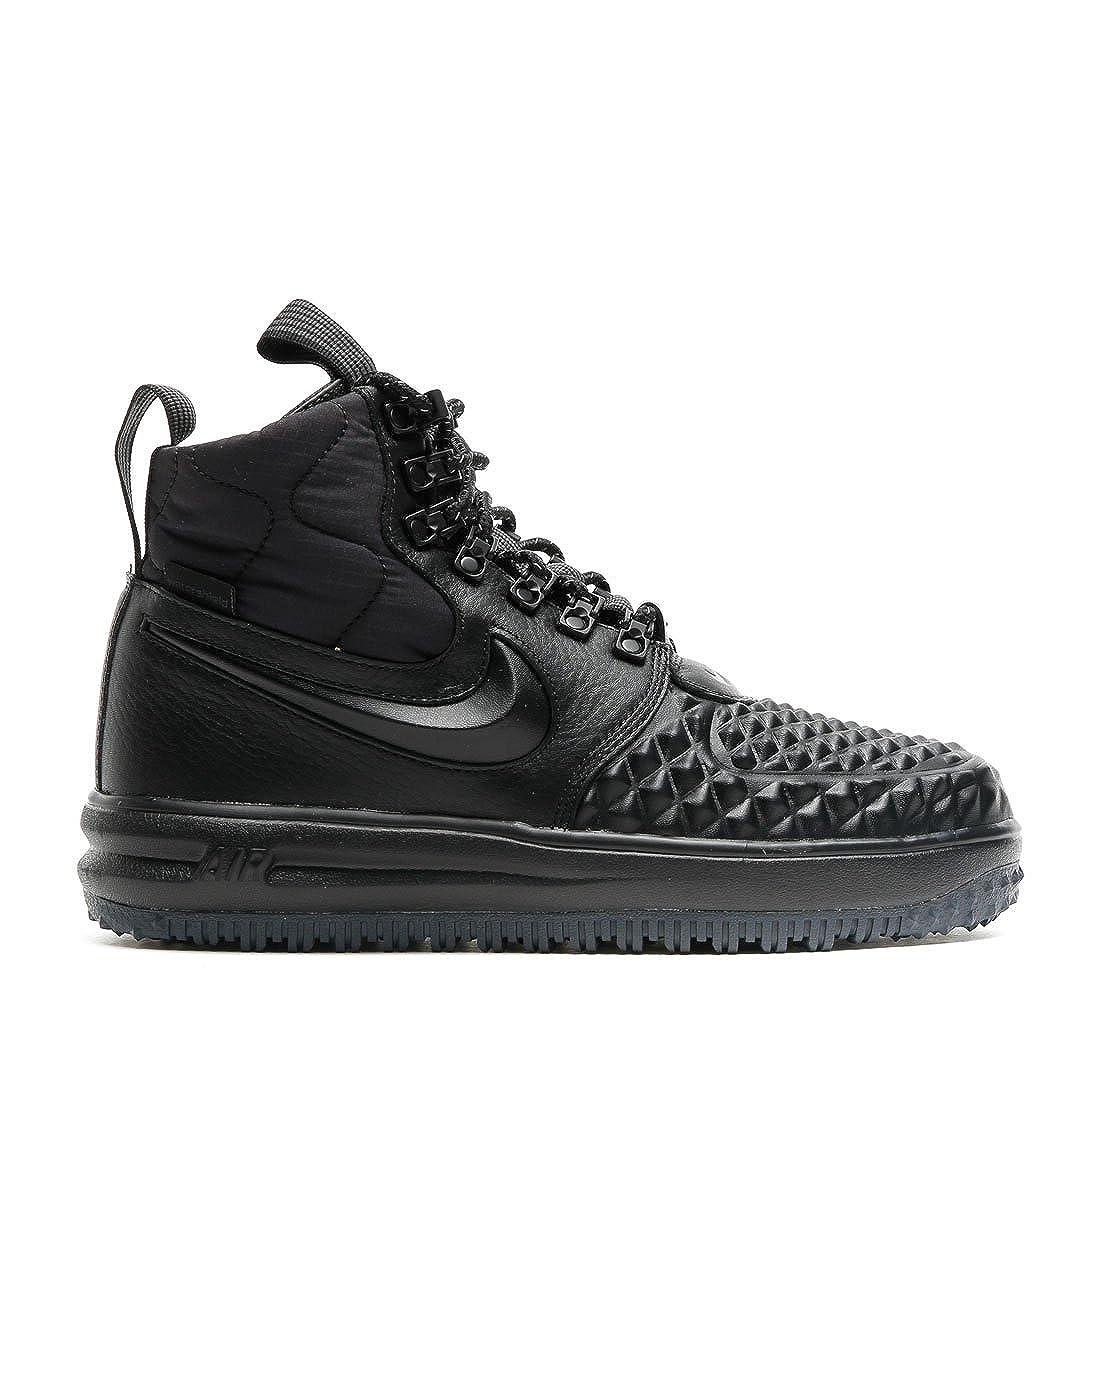 Black Nike Men's LF1 Duckboot '17 Casual shoes